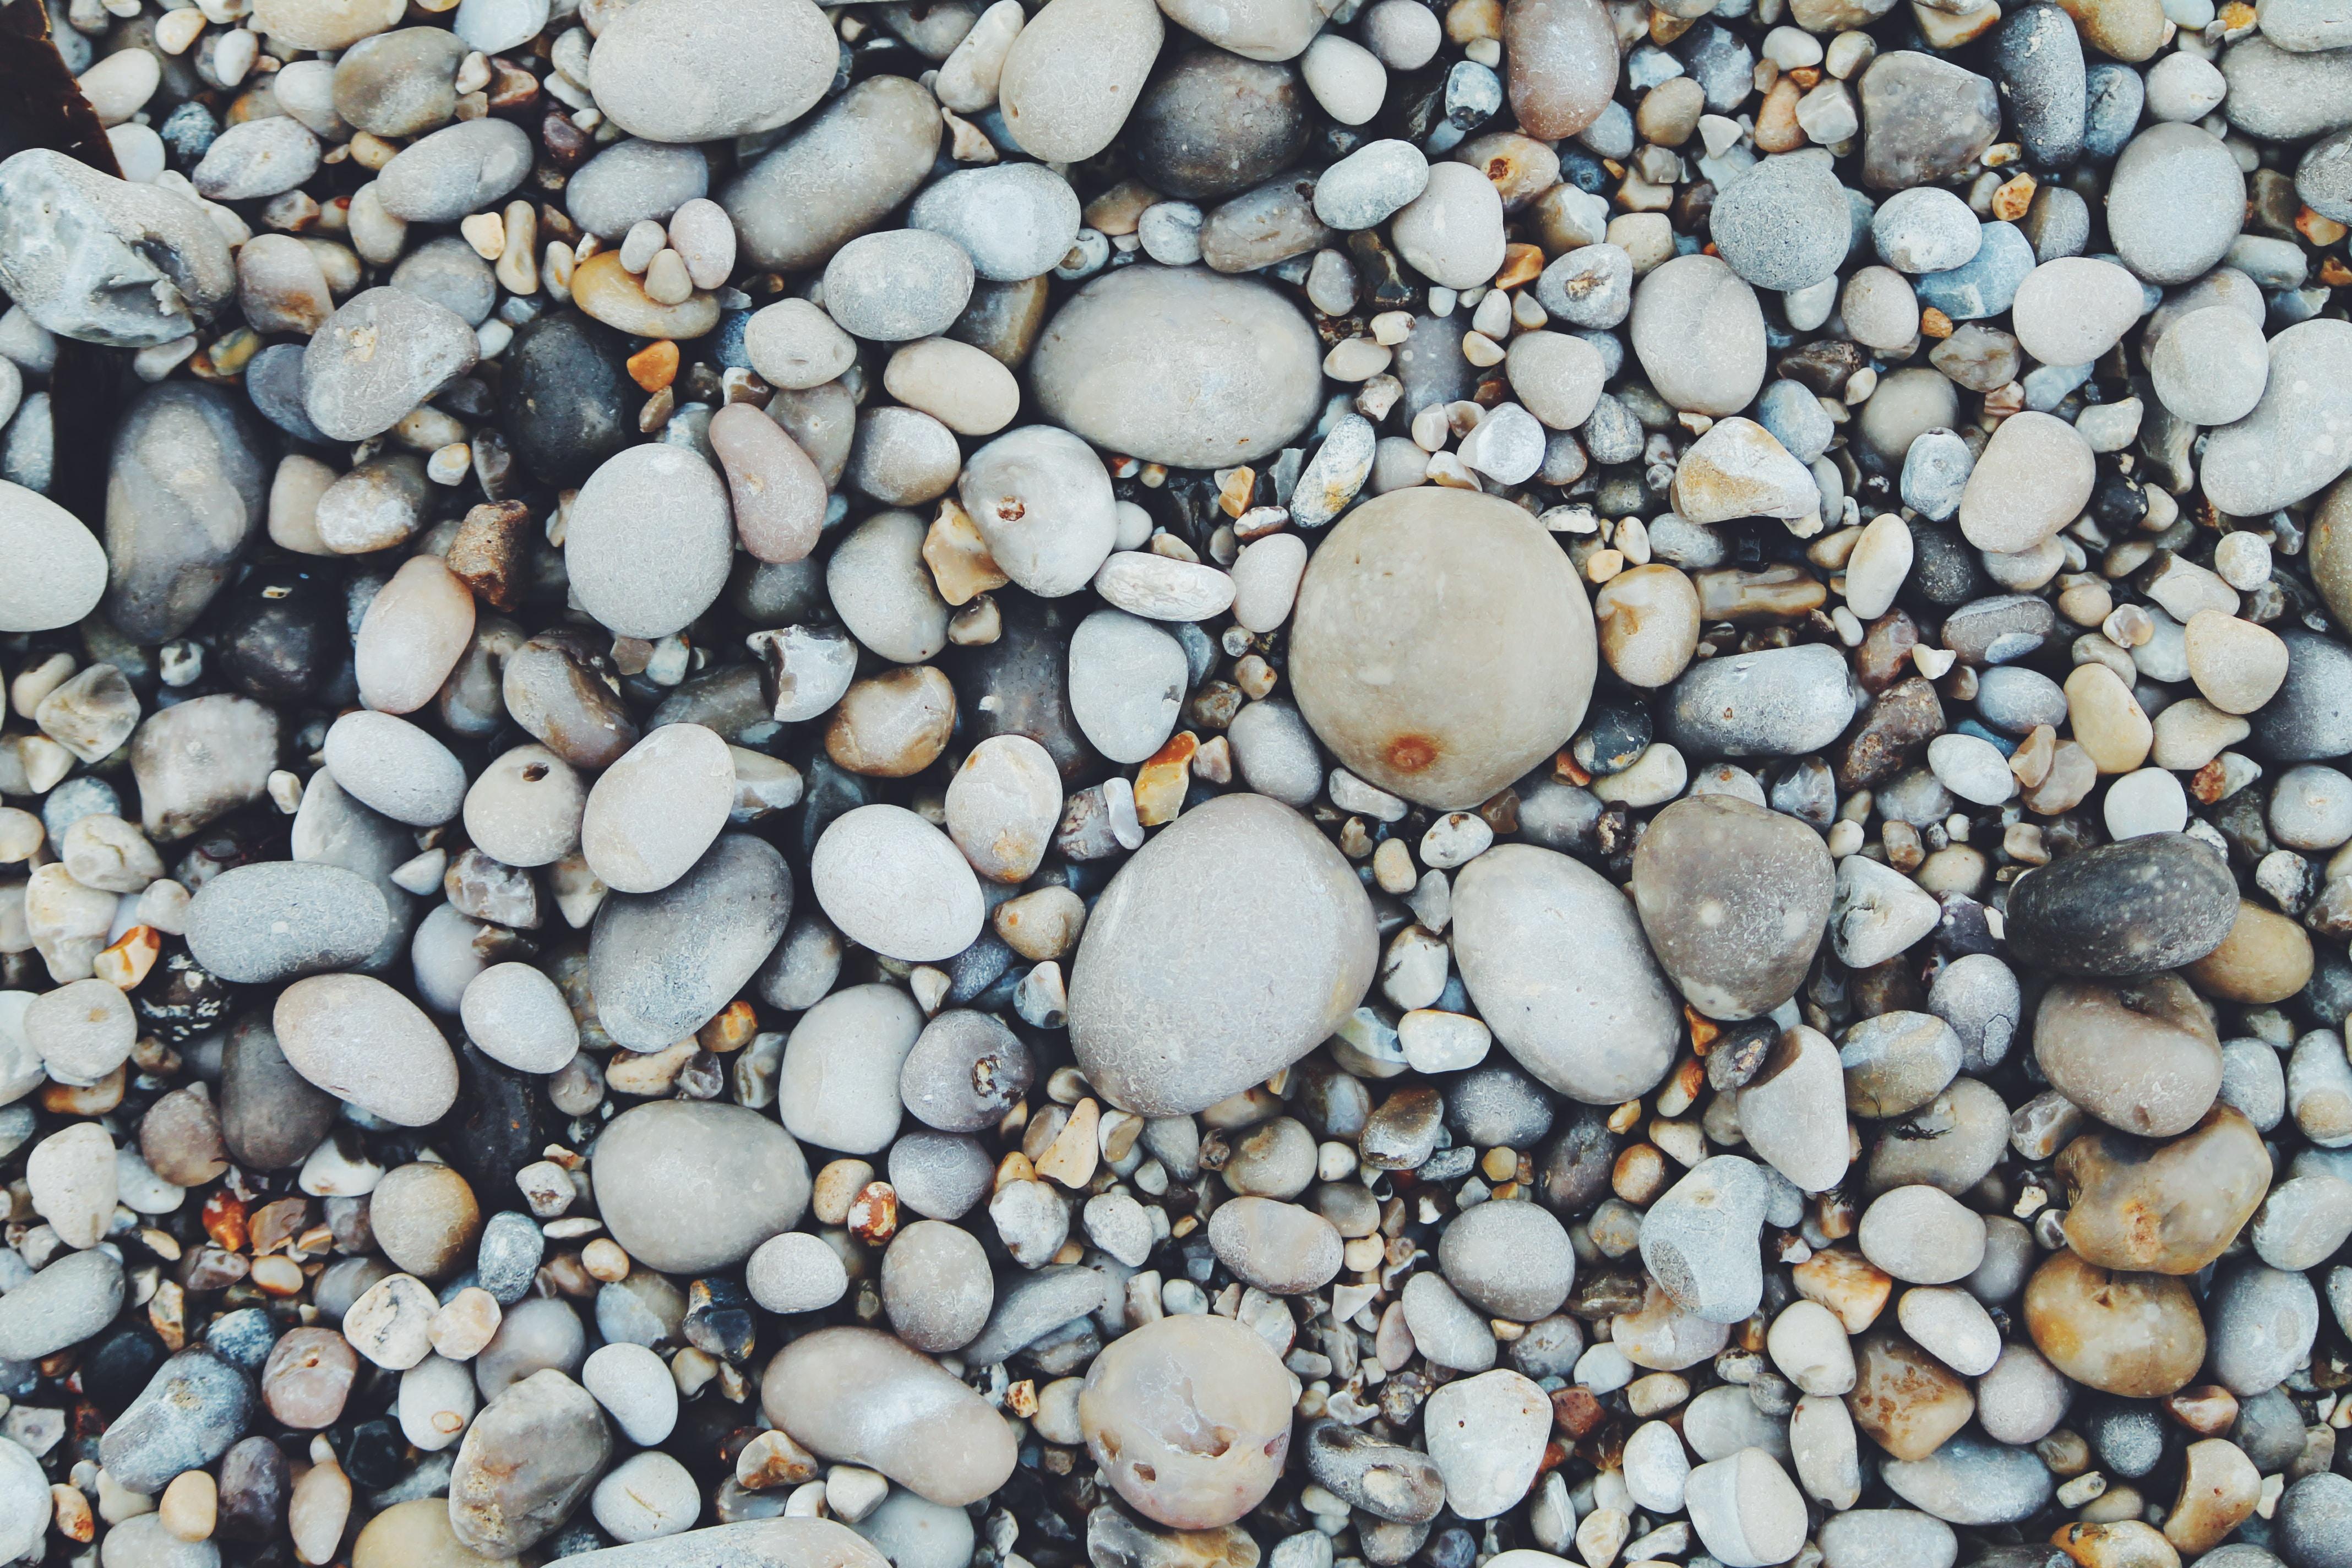 Sticks and stones dark stories